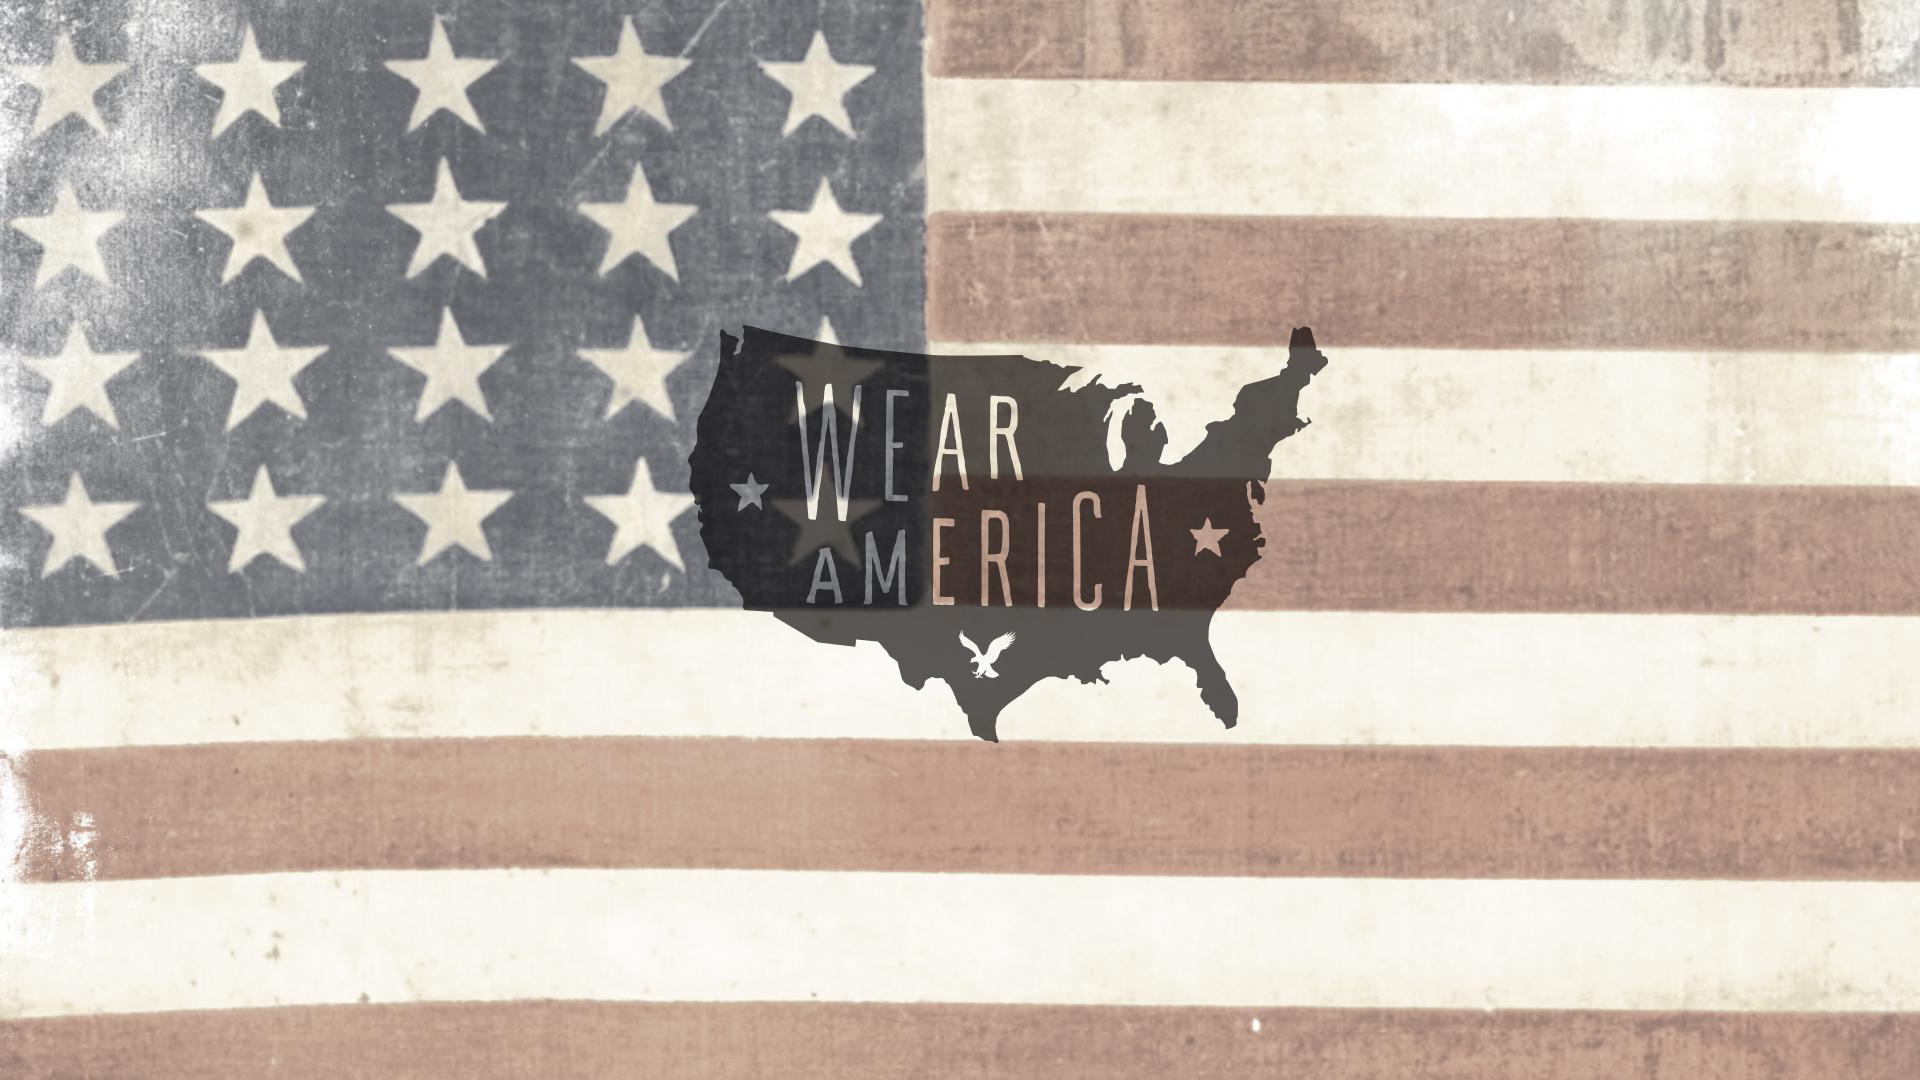 AE_WEAR_AMERICA_HEADER